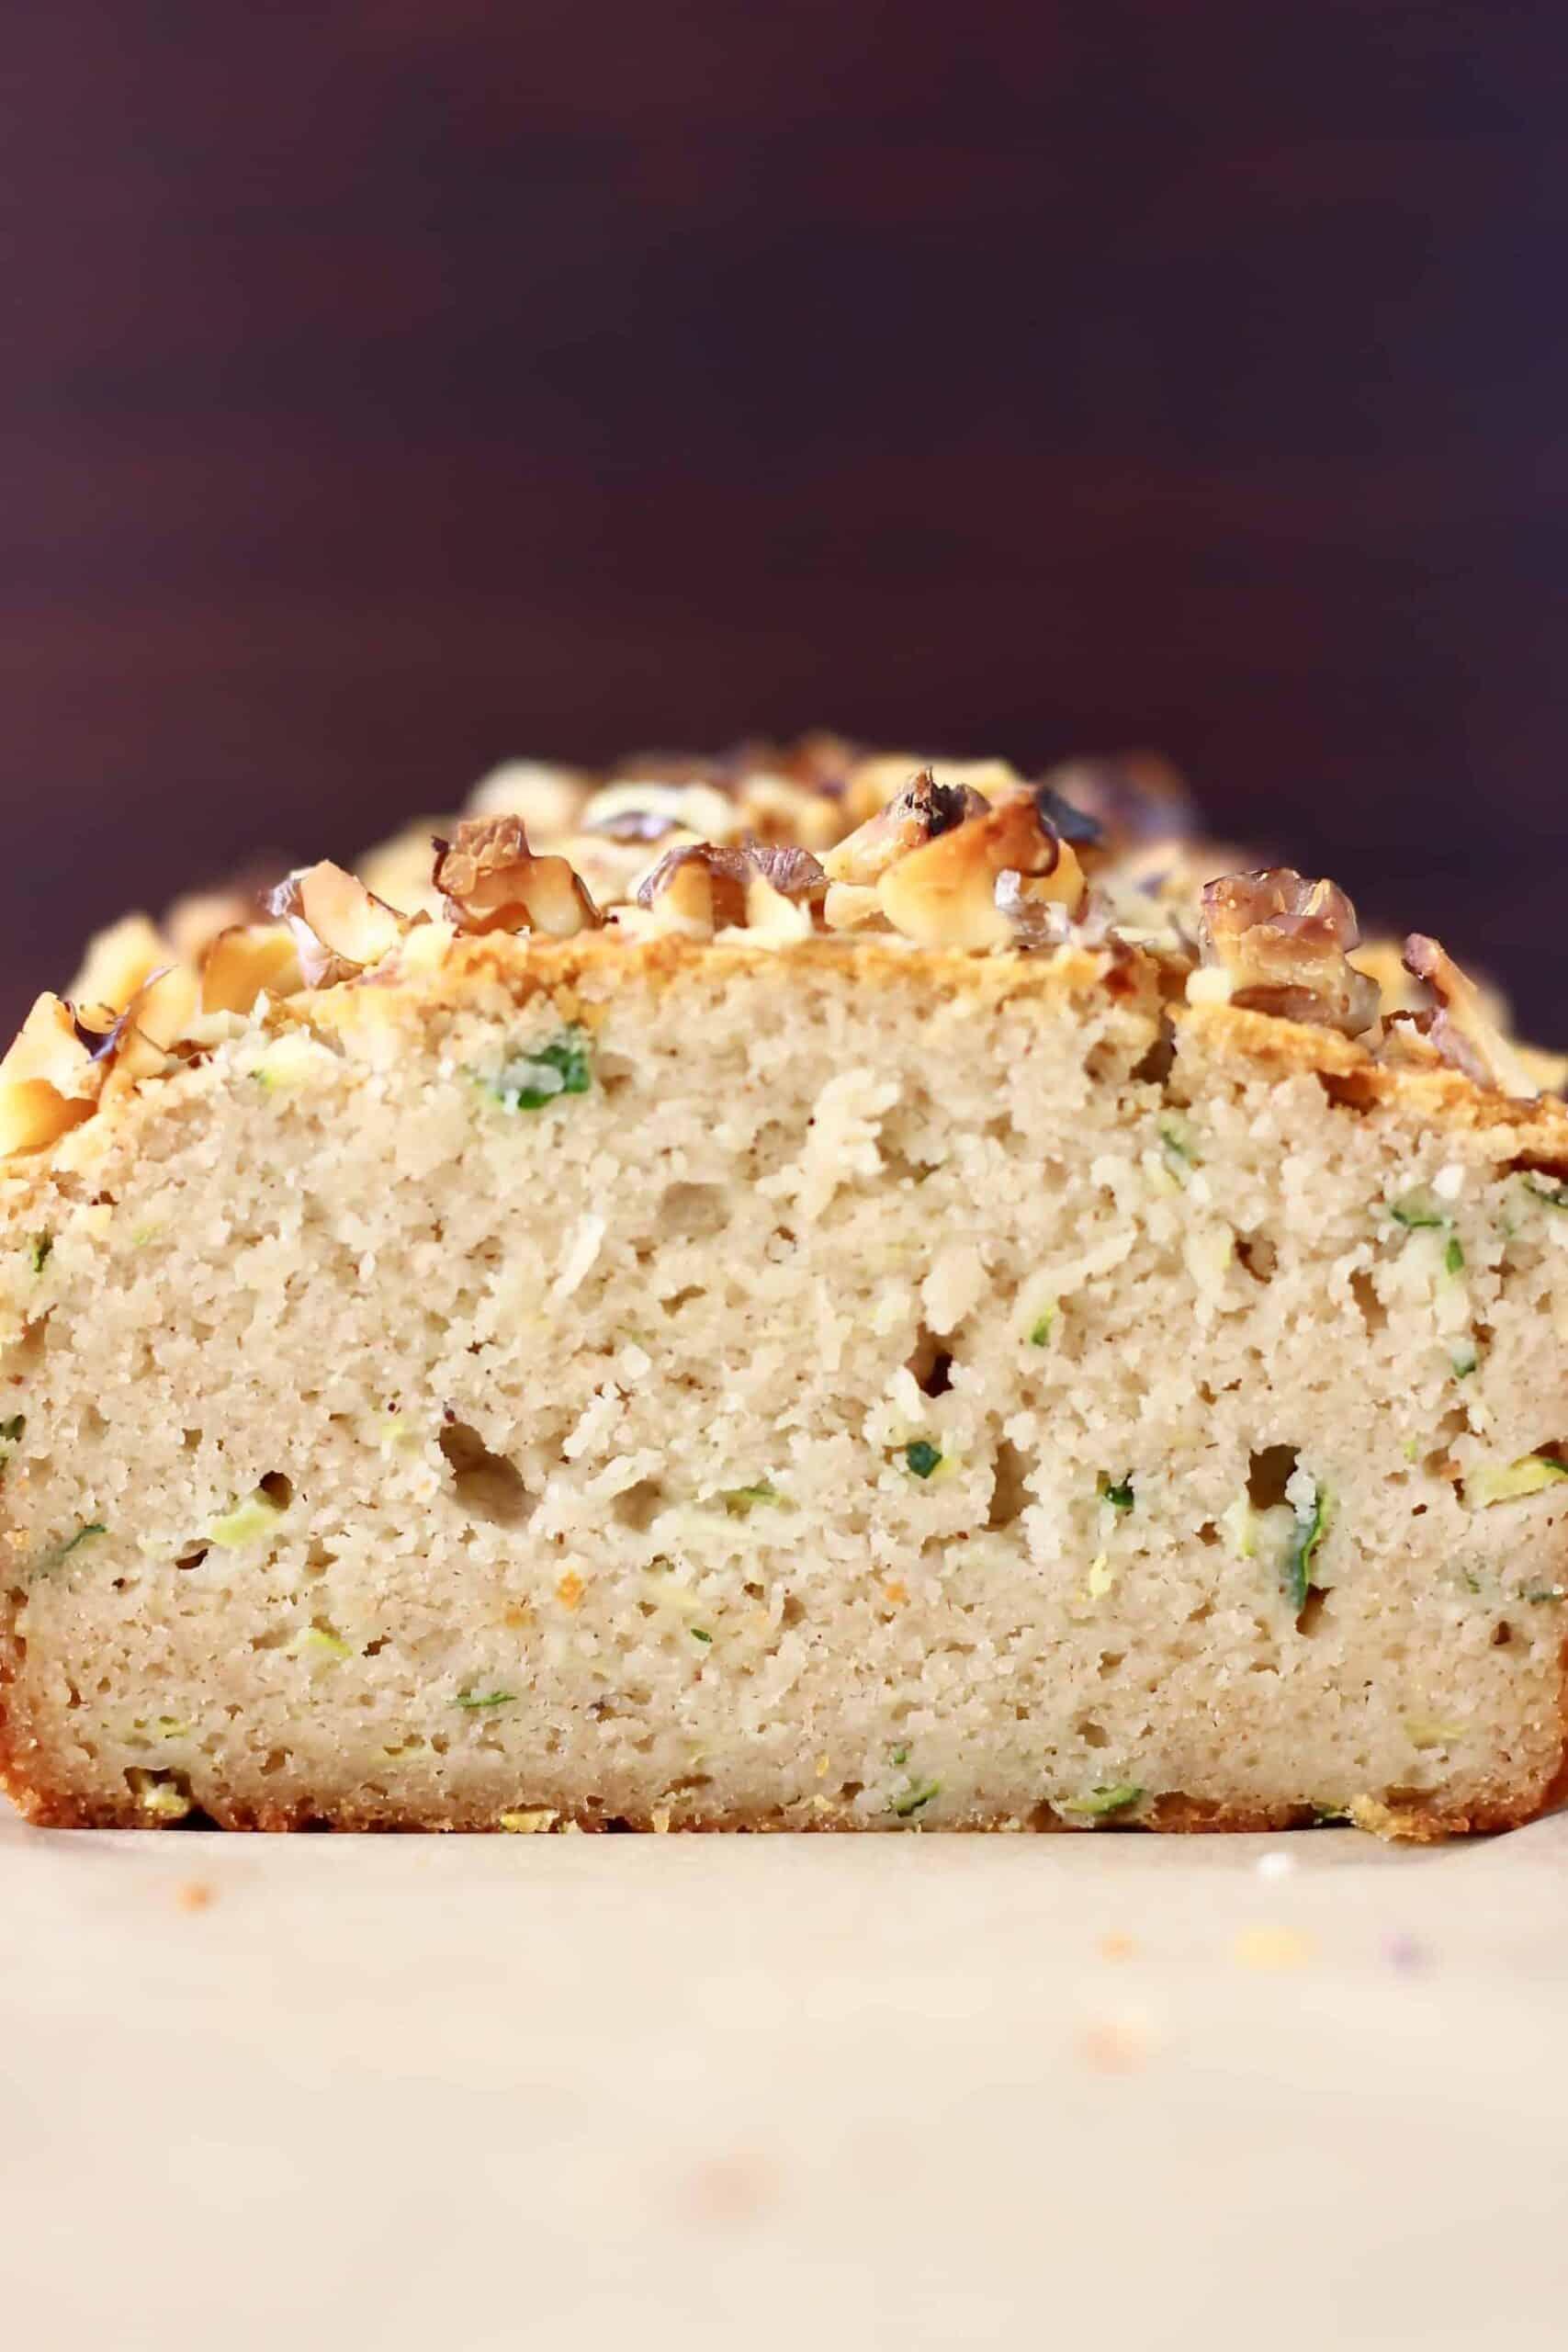 A sliced loaf of gluten-free vegan zucchini bread